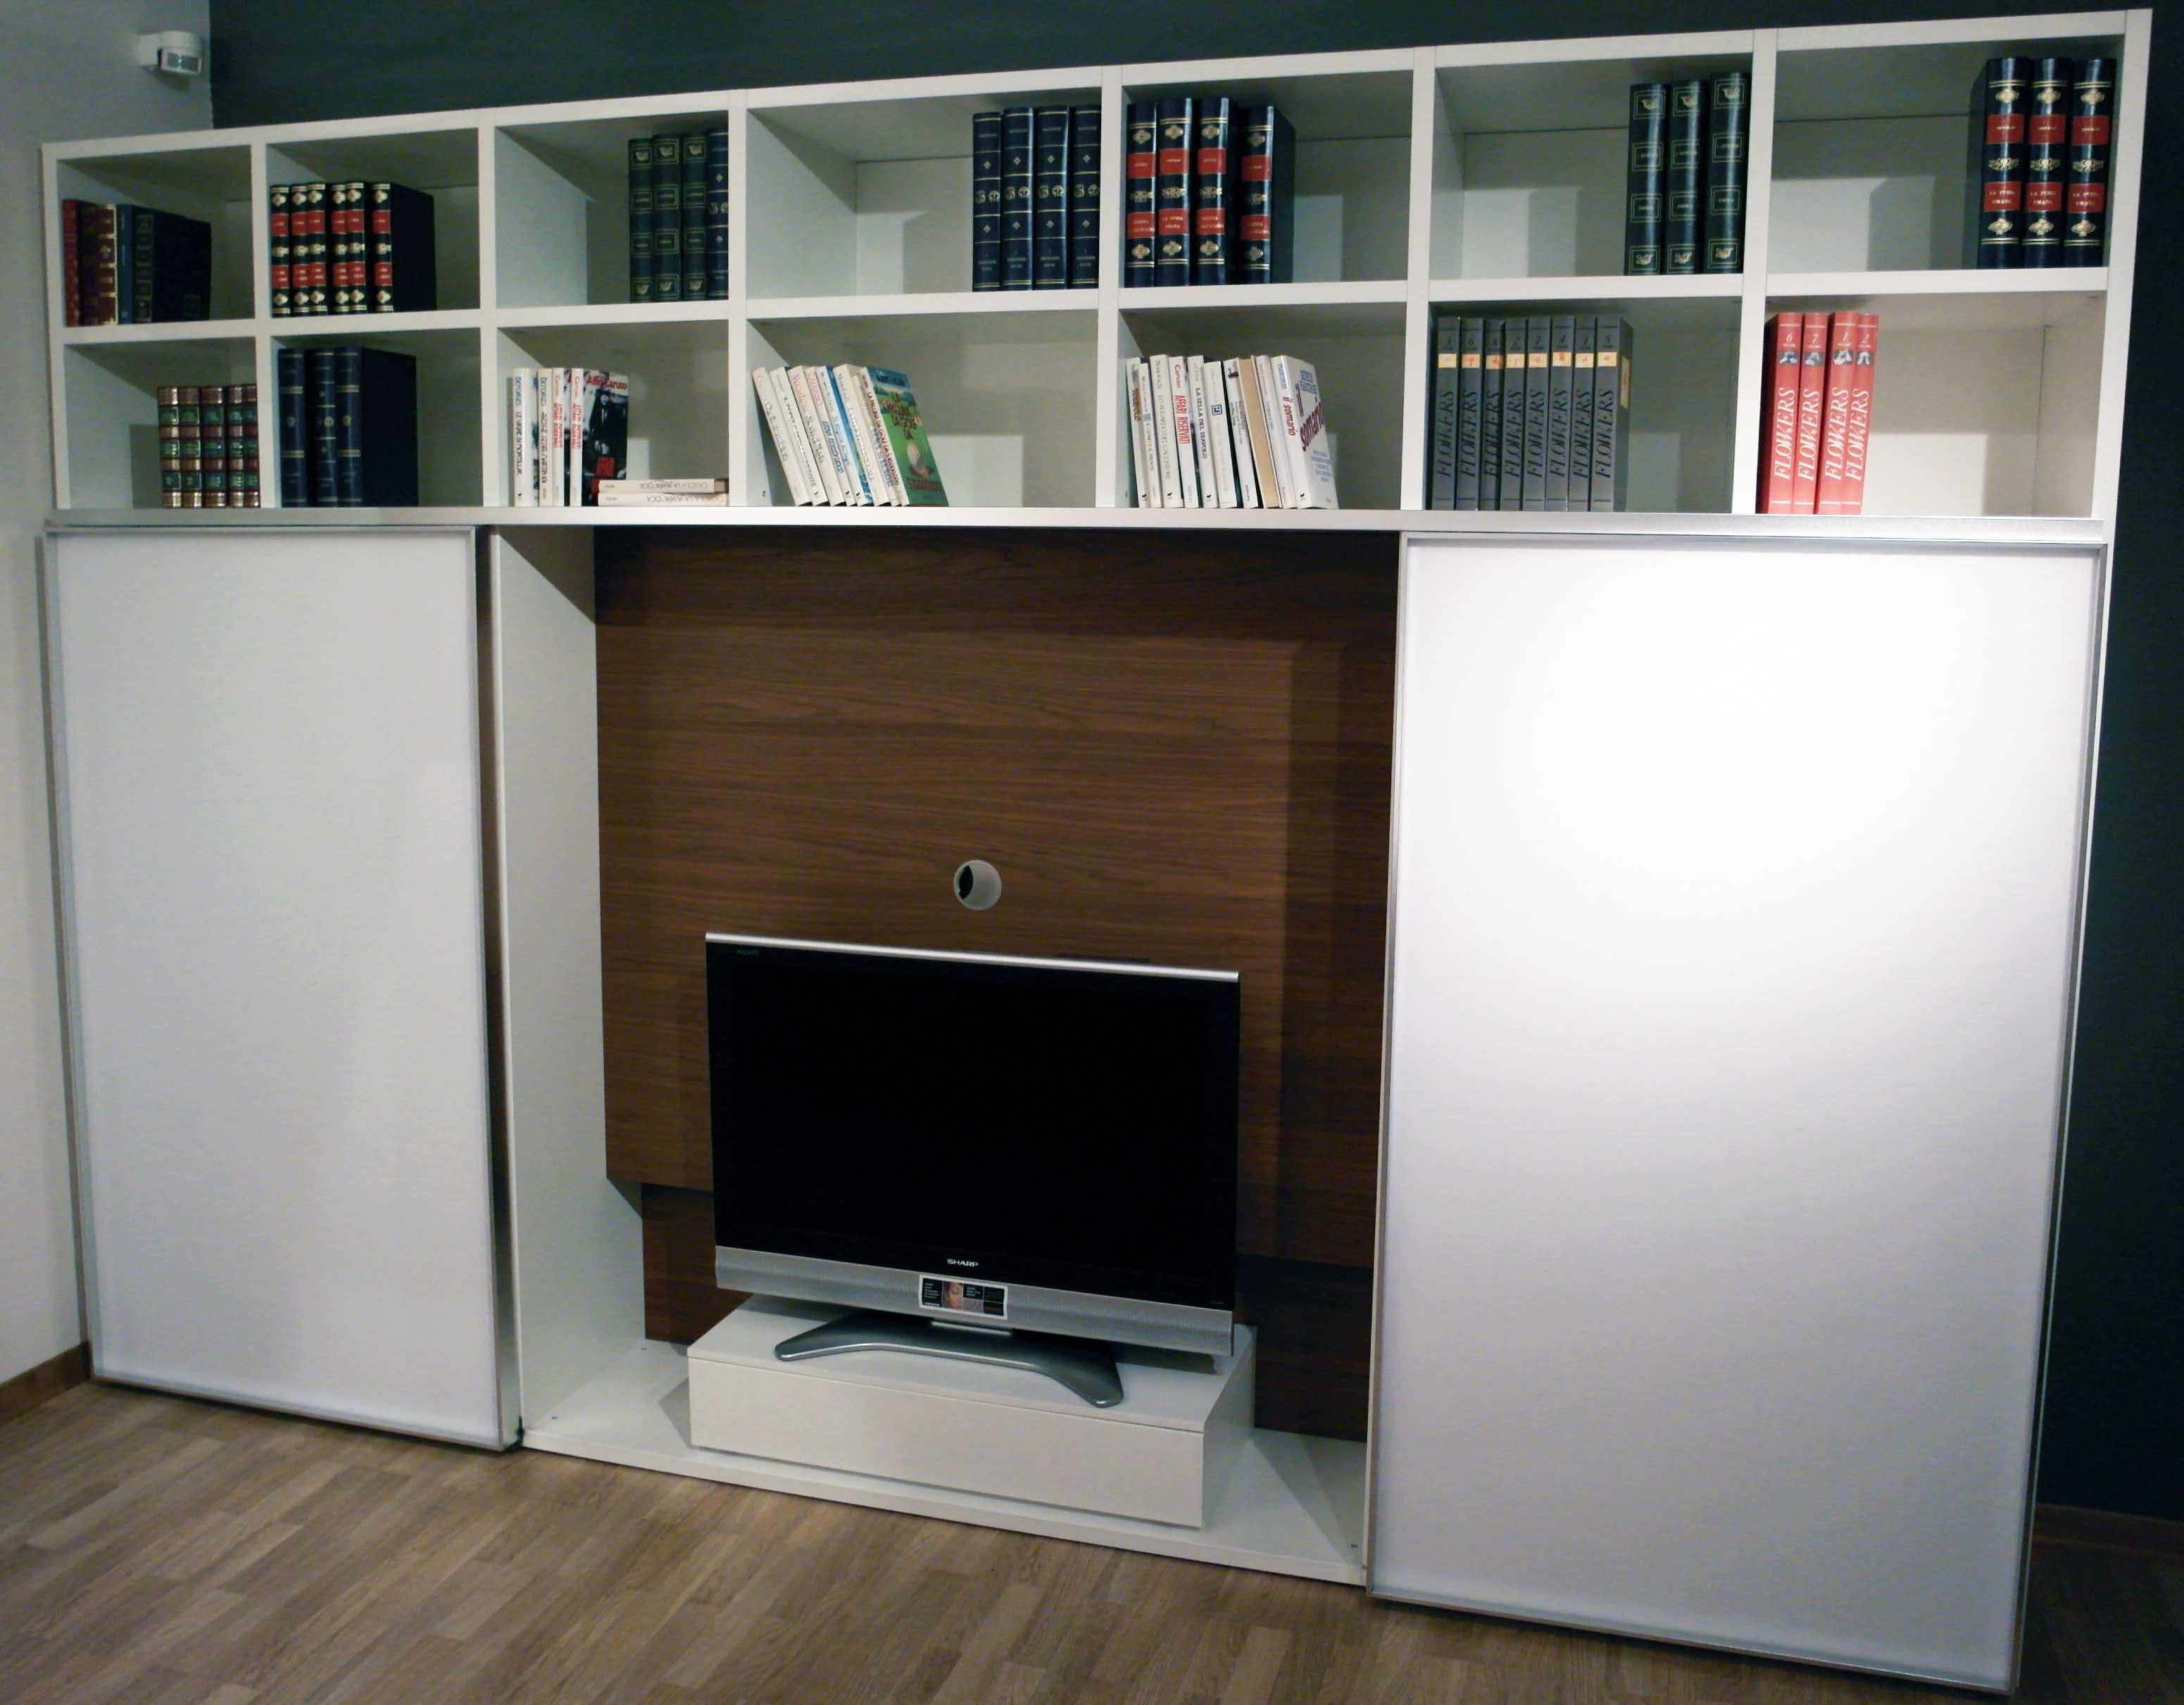 Awesome Librerie Soggiorno Photos - Idee Arredamento Casa - baoliao.us